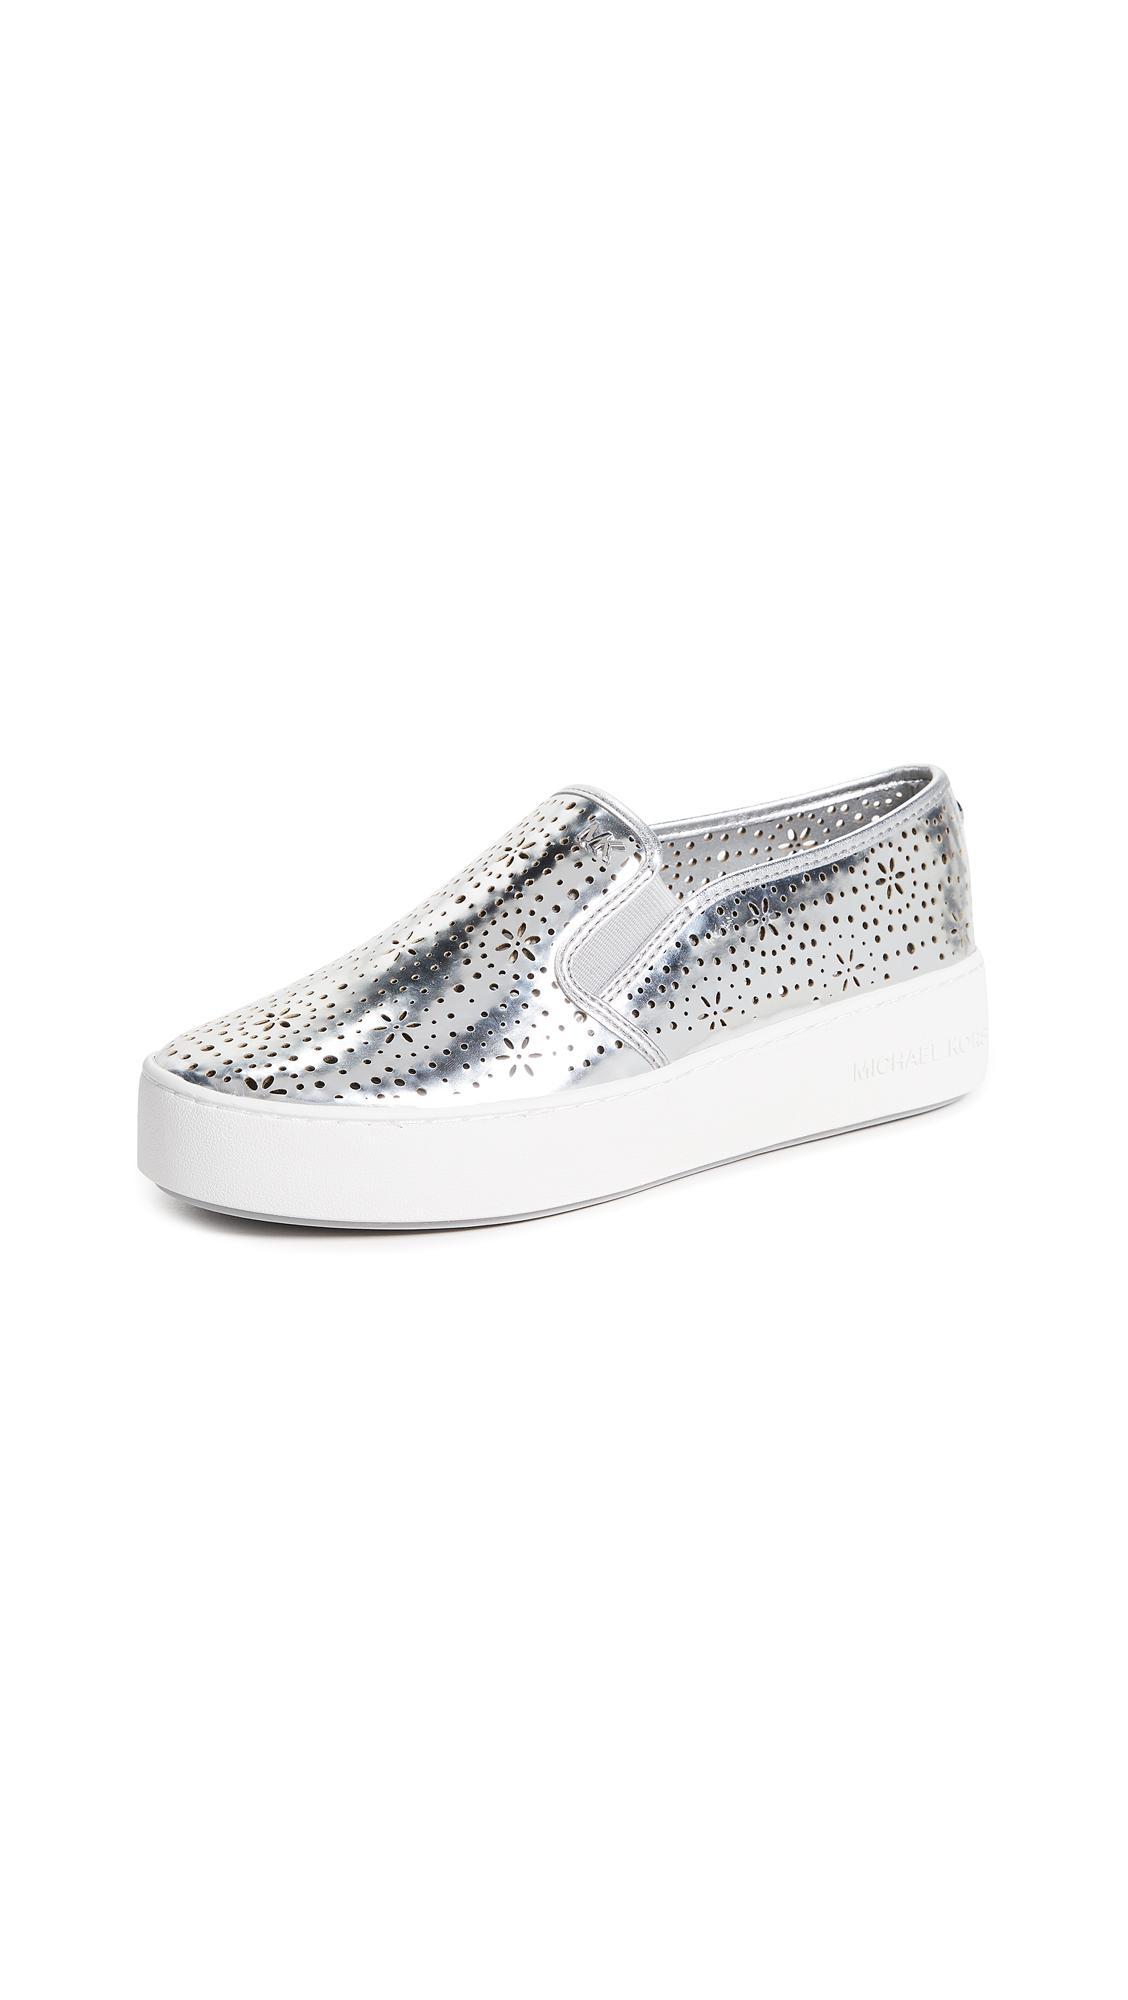 MICHAEL Michael Kors Trent Slip Ons - Silver